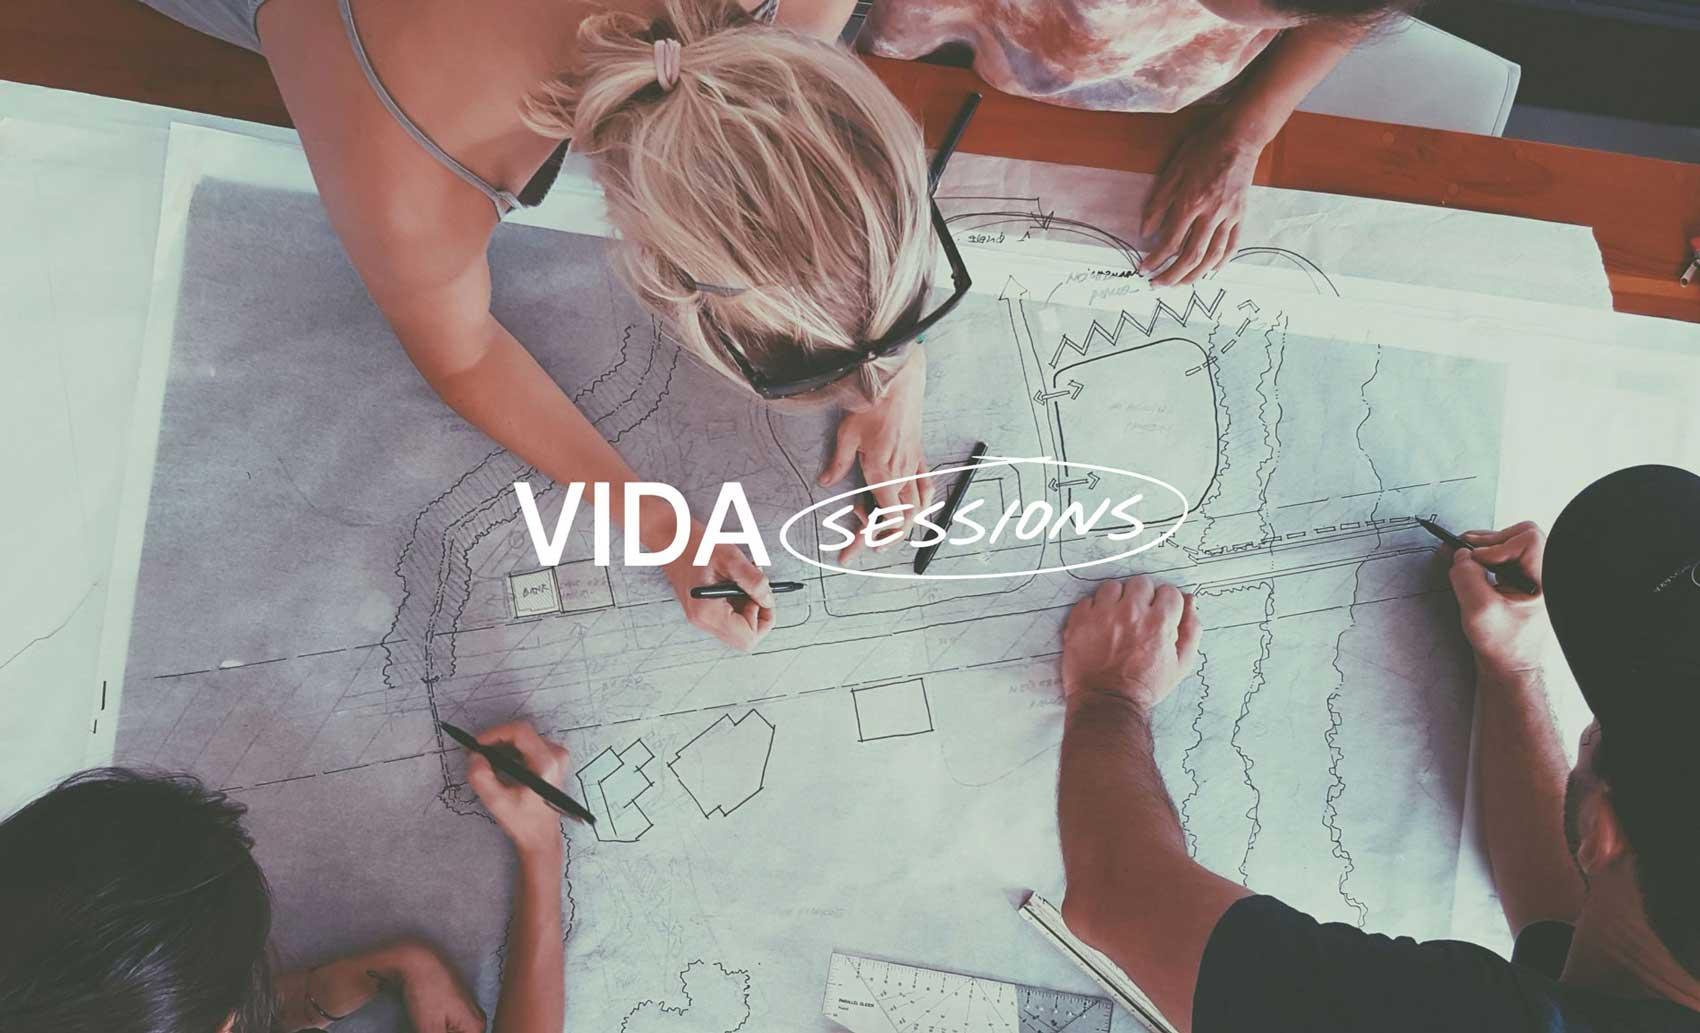 vida_sessions